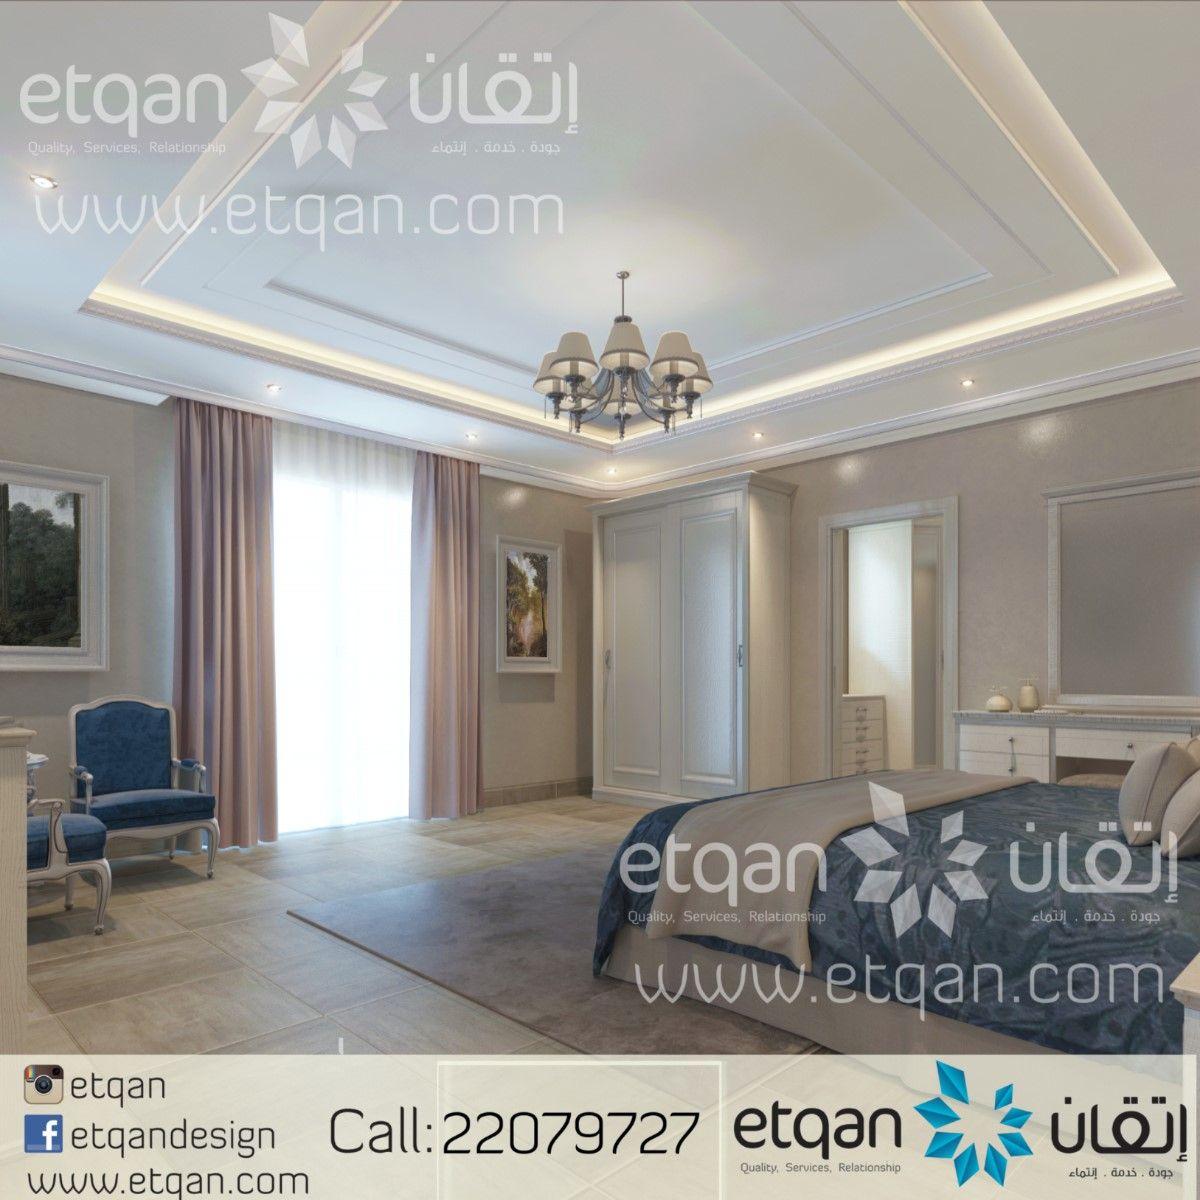 95 Home Entry Hall Ideas For A First Impressive Impression: غرفة نوم بسيطة و جميلة و راقية . . #غرفة #نوم #master